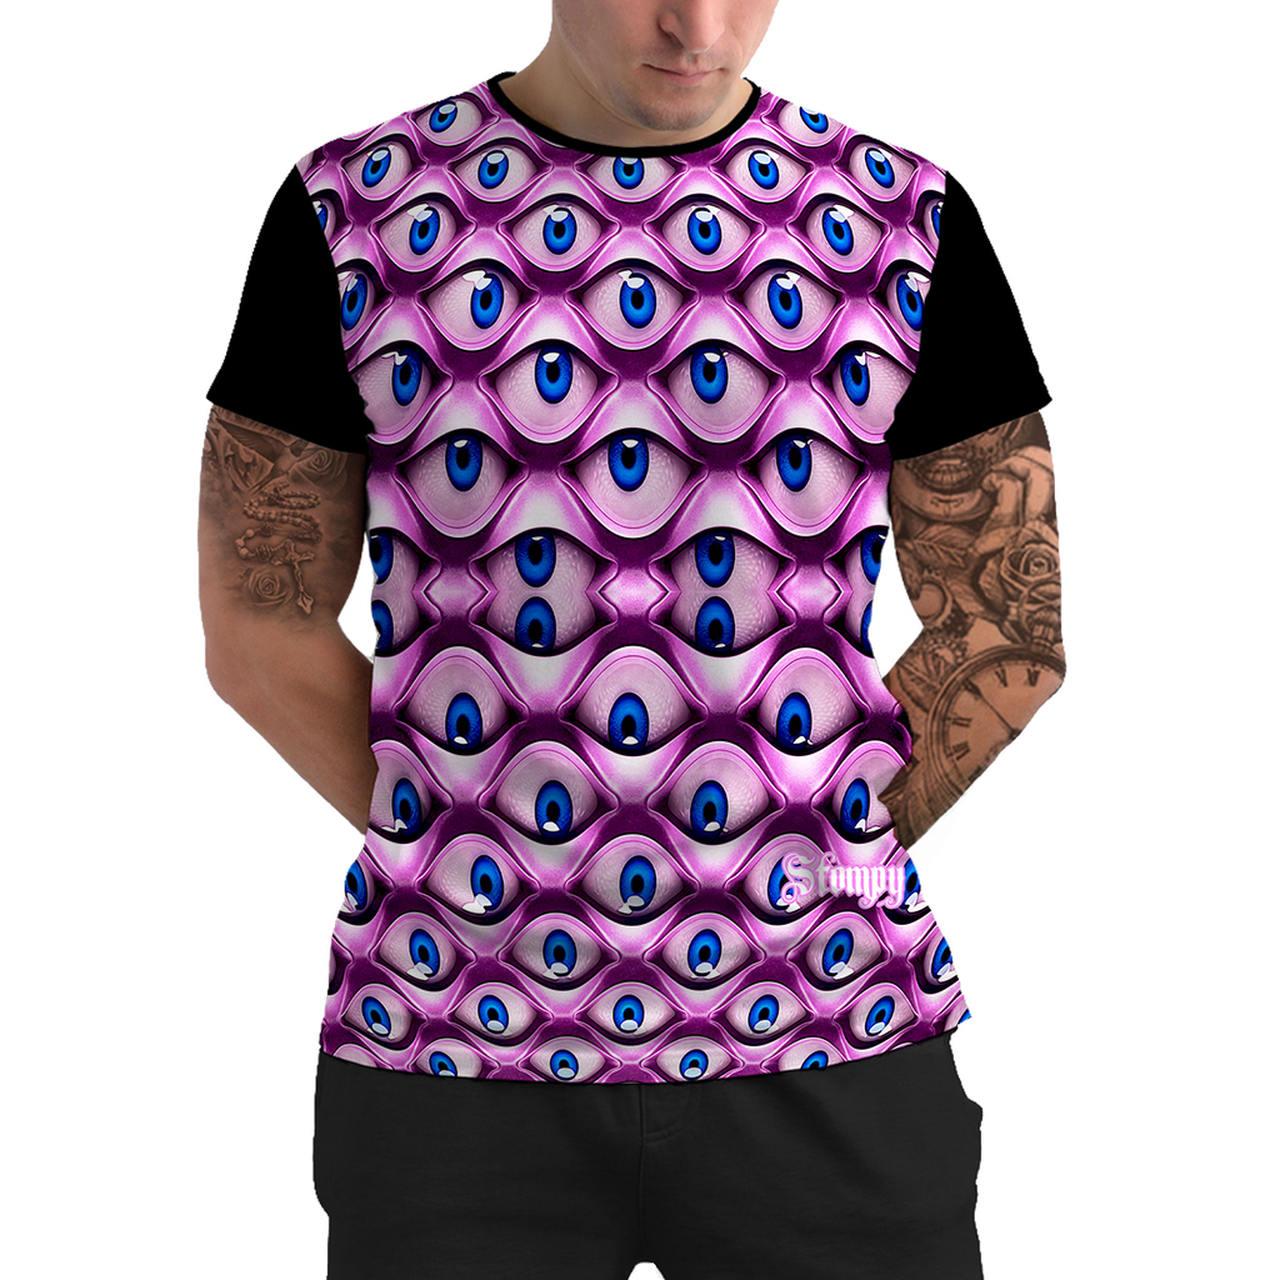 Stompy Camiseta Manga Curta Psicodelica Modelo 57